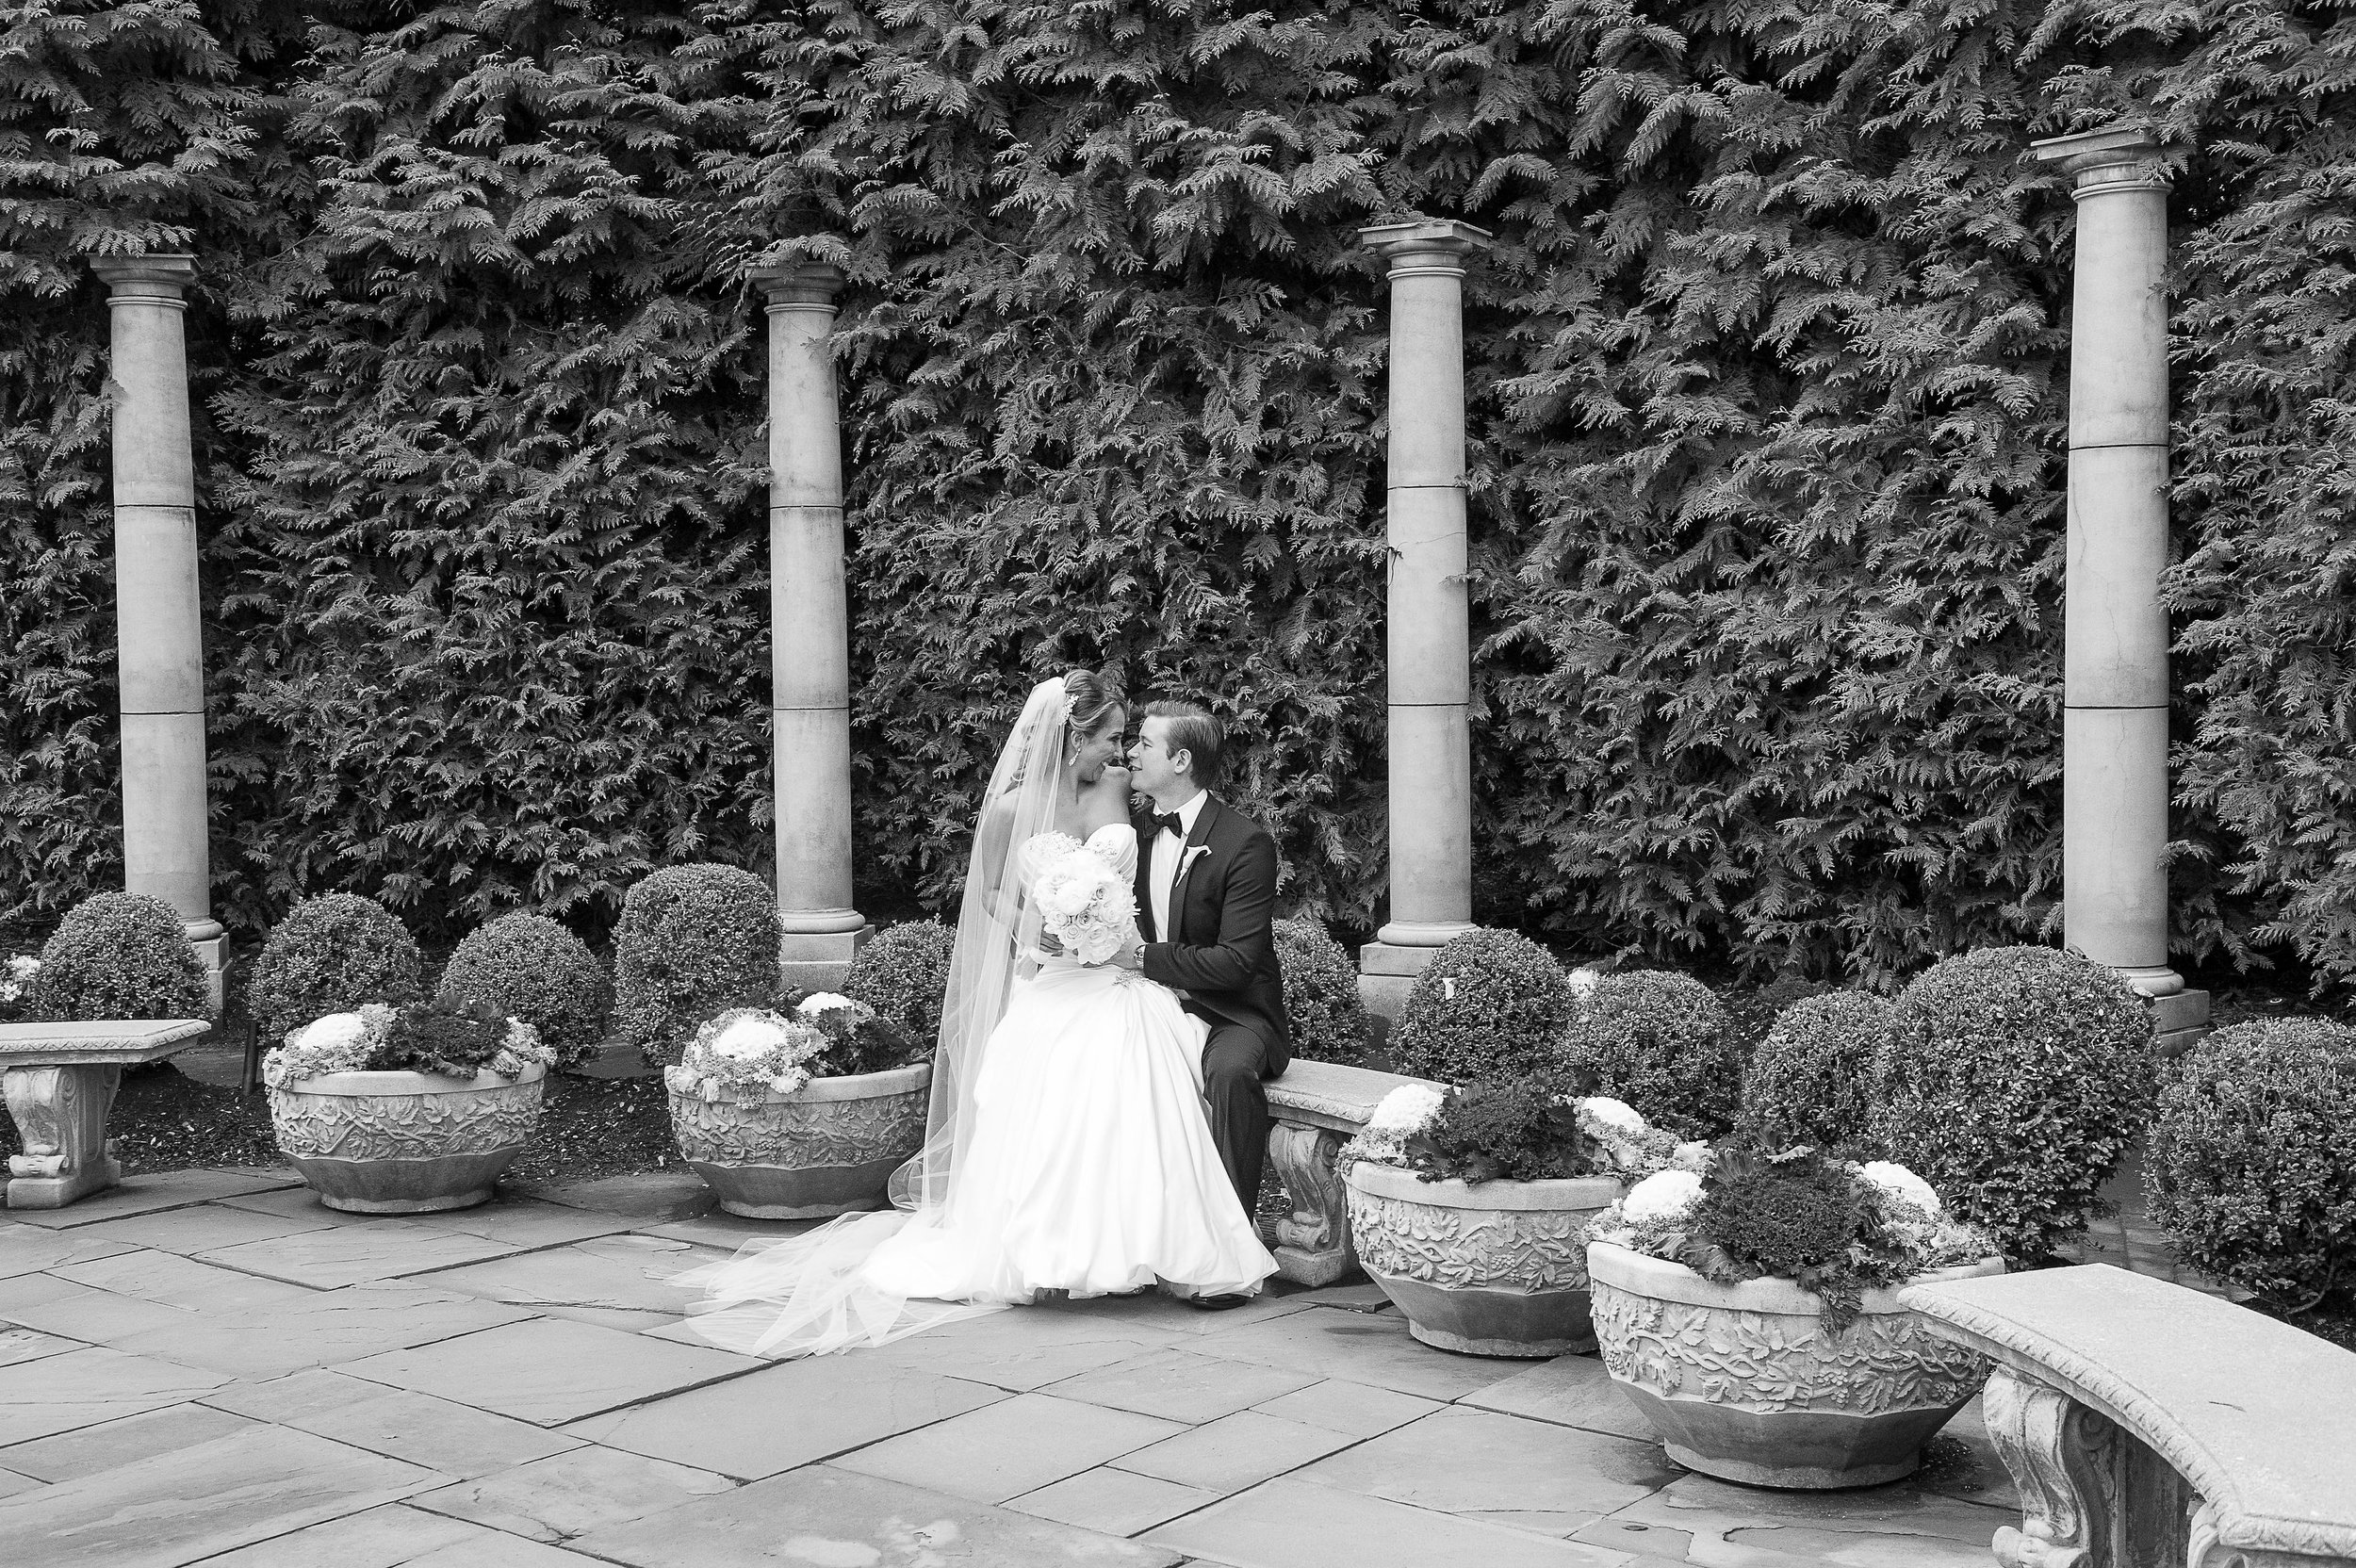 Ceci_New_York_Custom_Invitation_ New_Jersey_Wedding_Luxury_Personalized_Ceci_Style_Bride_Foil_Stamping95.JPG